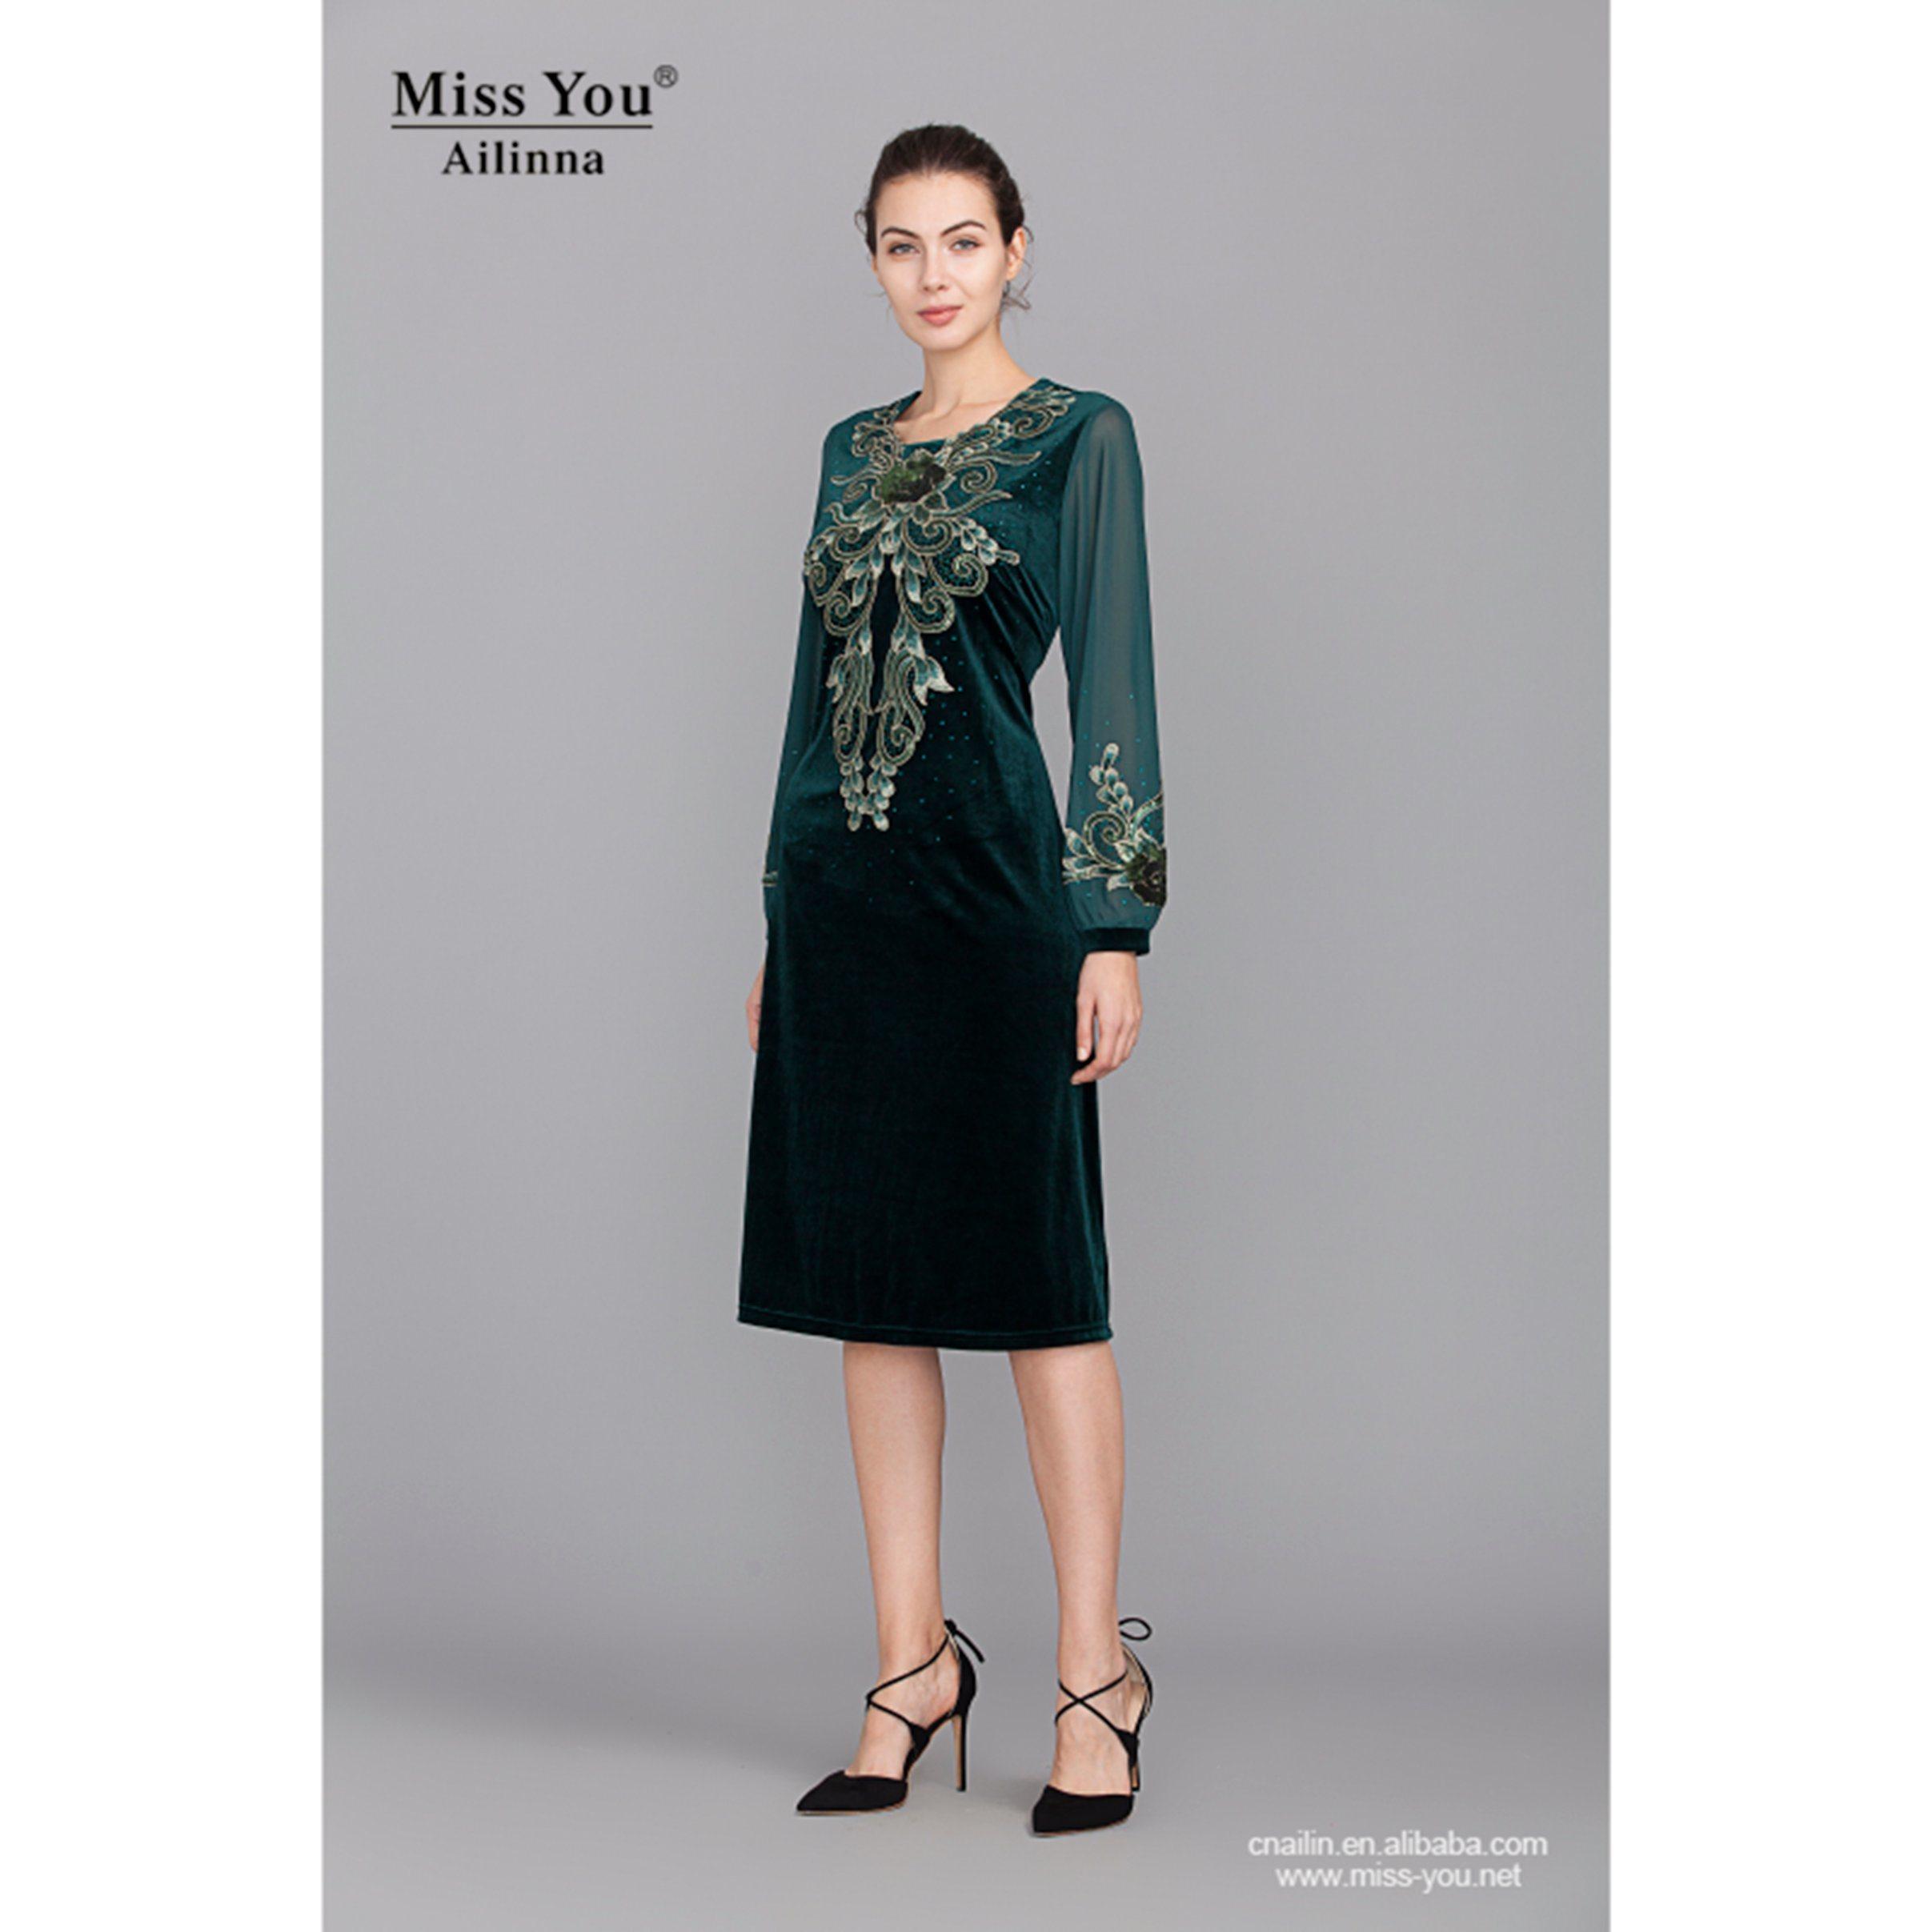 Miss You Ailinna 305446 Fashion Customized Long Sleeve One-Piece Dress